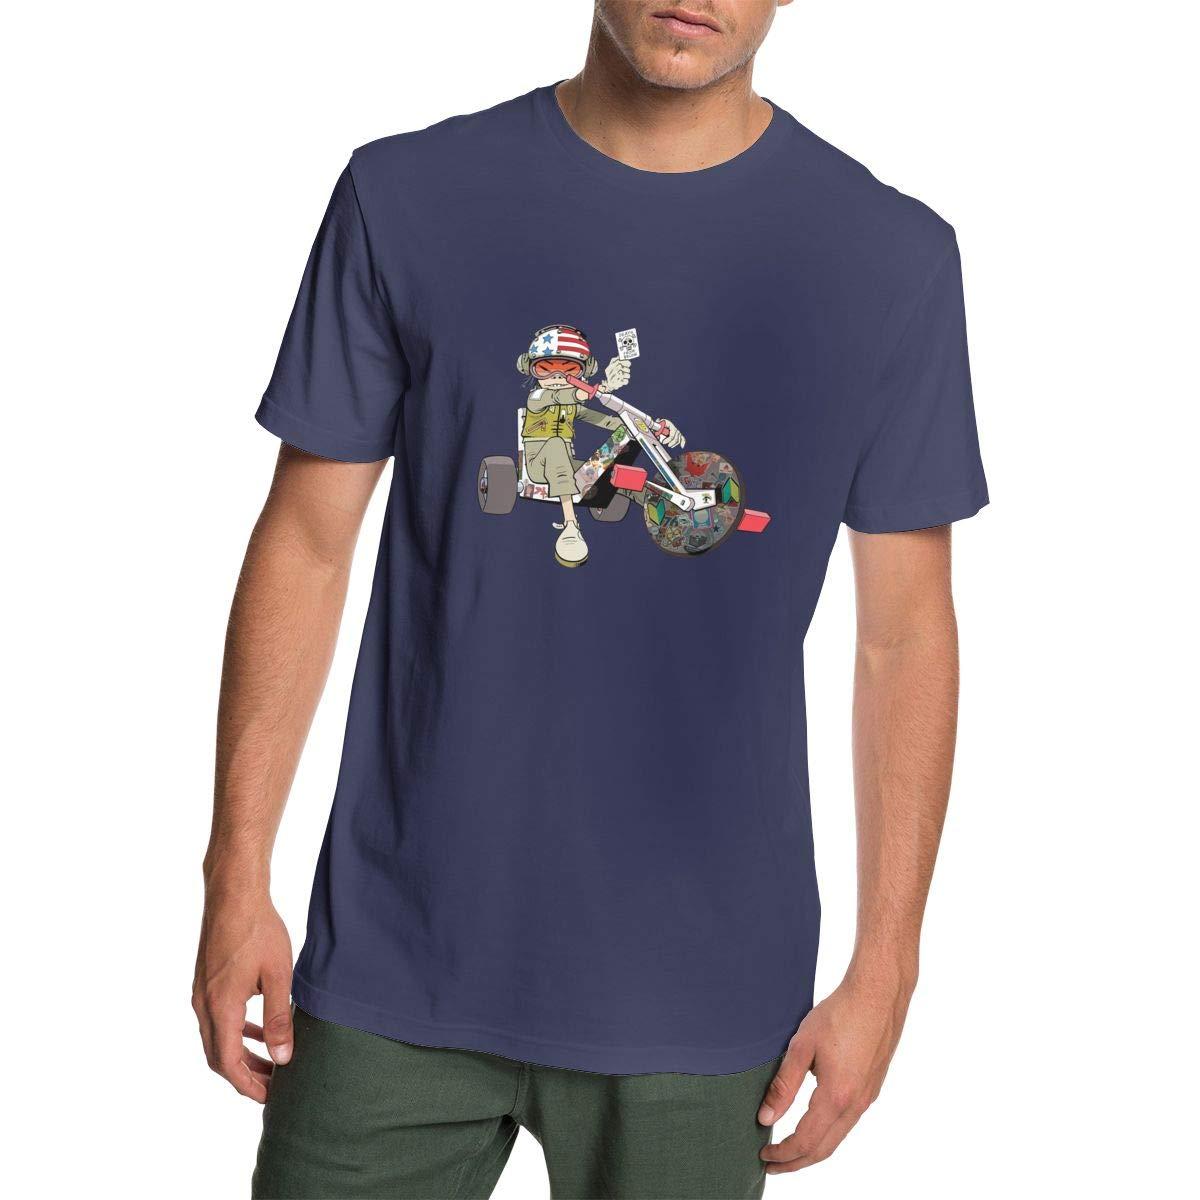 OWEDR Interesting T-Shirts Jamie Hewlett Gorrilaz Mens Shirts Cotton Tee